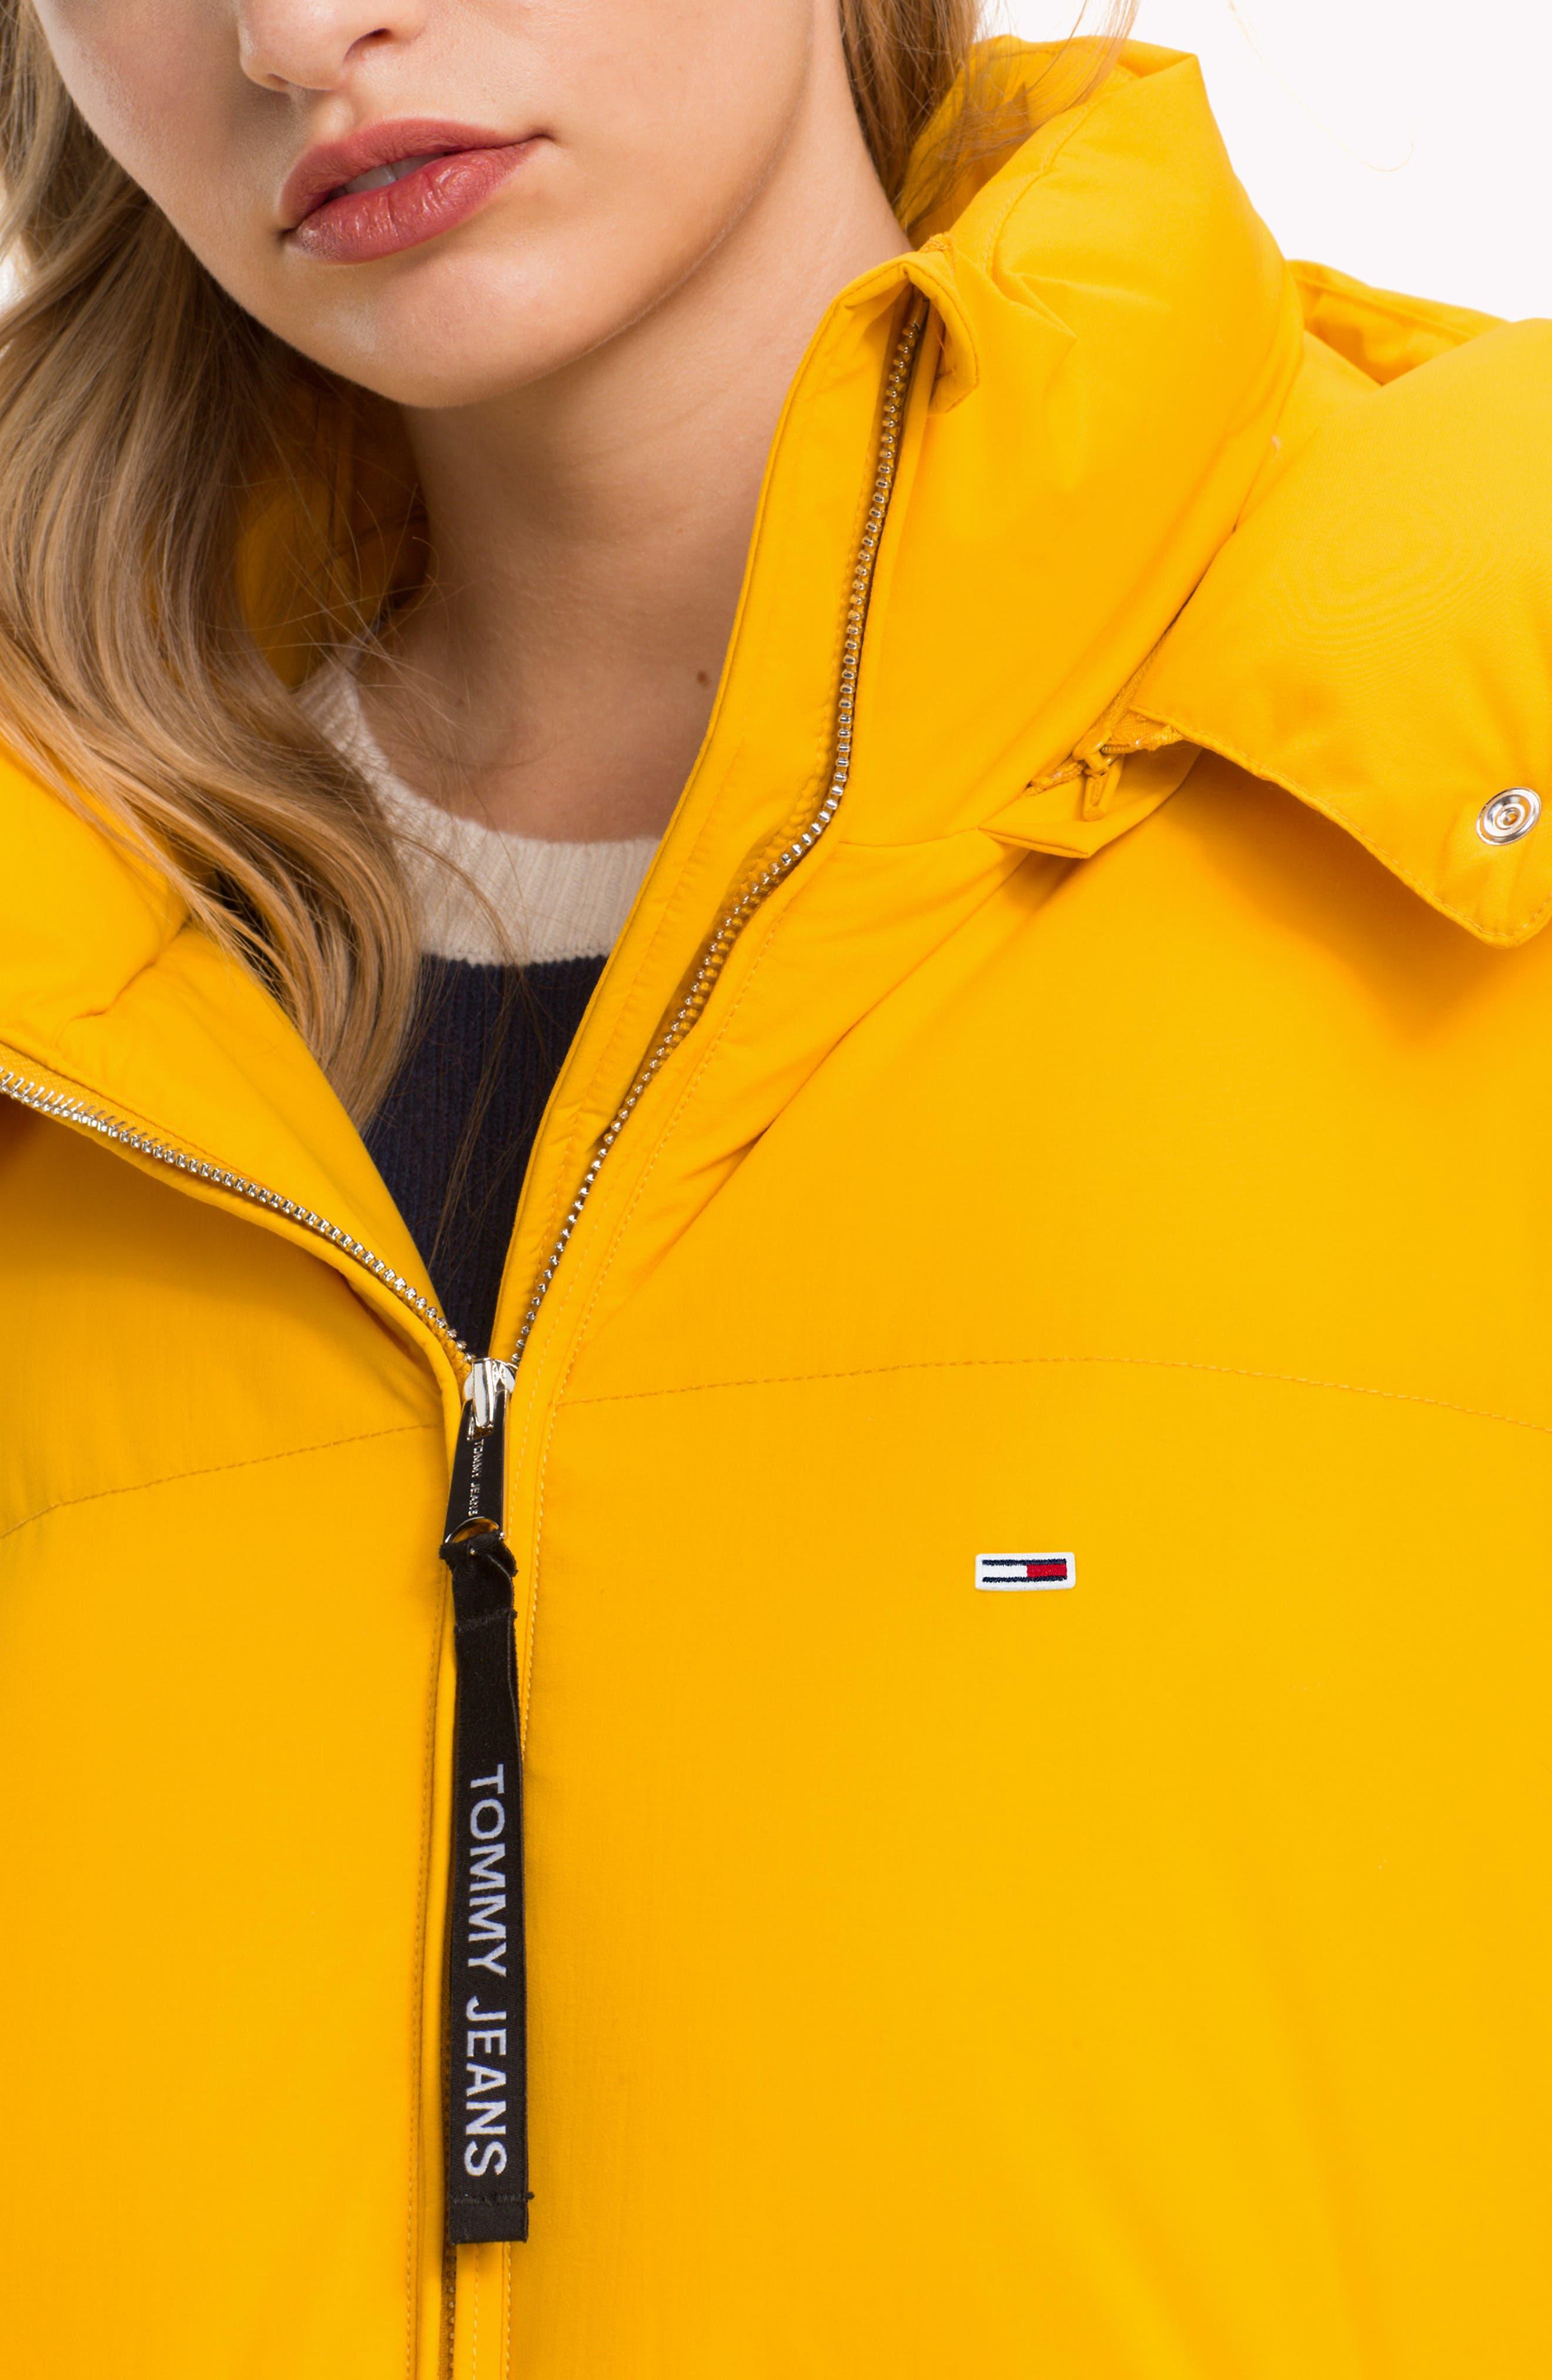 TJW Oversized Puffer Jacket,                             Alternate thumbnail 8, color,                             MANGO MOJITO